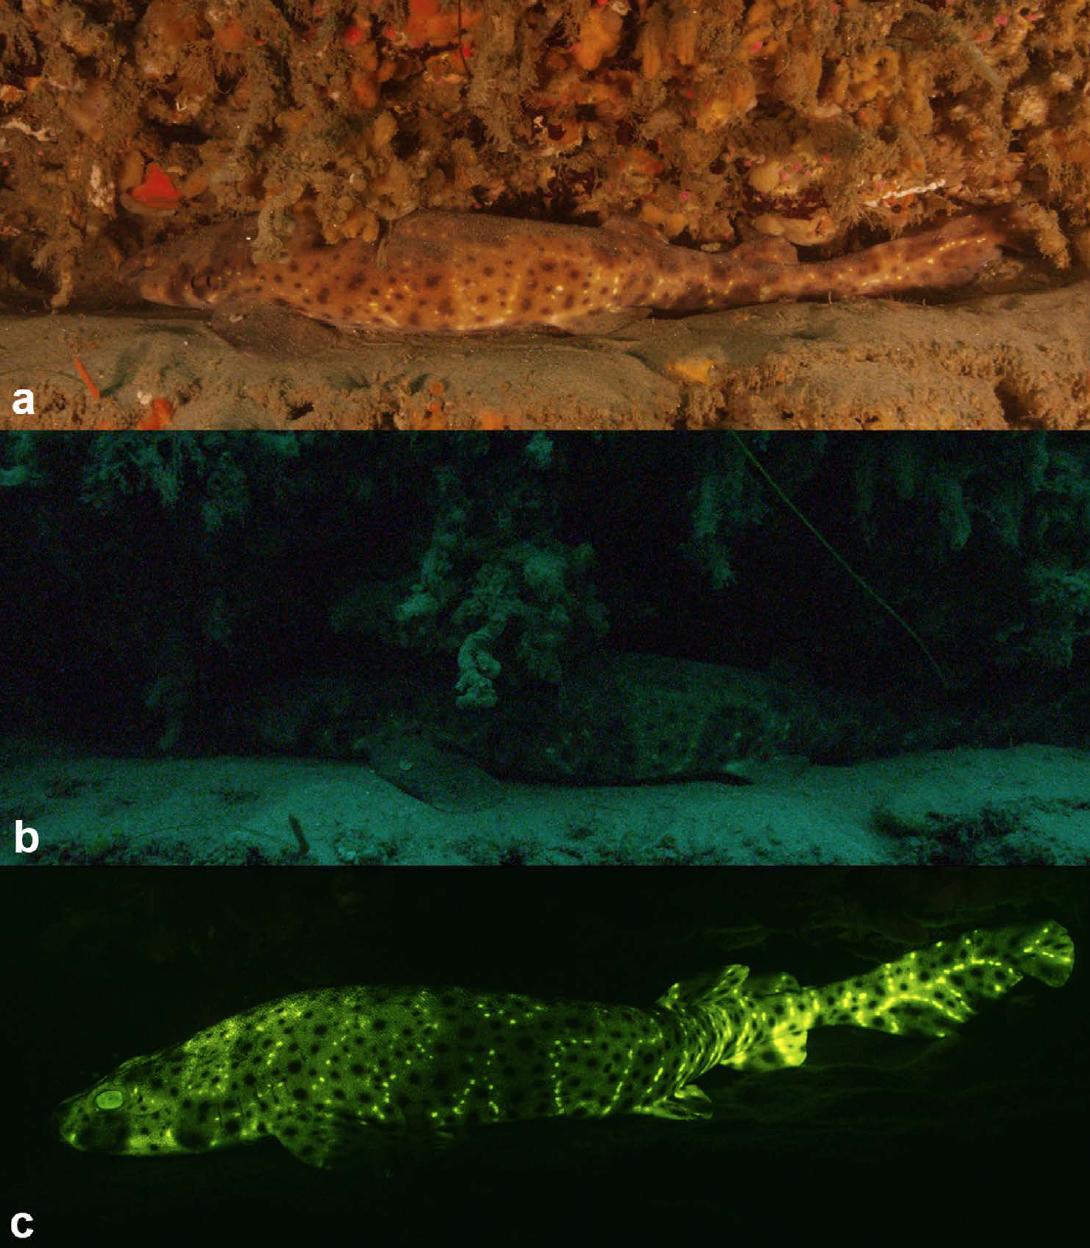 Visualization of Biofluorescence in Sharks - 21. Gruber, D.F., Loew, E.R., Deheyn, D.D., Akkaynak, D., Gaffney, J.P., Smith, W.L., Davis, M.P., Stern, J.H., Pieribone, V.A., and Sparks, J.S. (2016). Biofluorescence in Catsharks (Scyliorhinidae): Fundamental Description and Relevance for Elasmobranch Visual Ecology. Scientific Reports. 6, 24751; doi: 10.1038/srep24751Google ScholarOPEN ACCESS